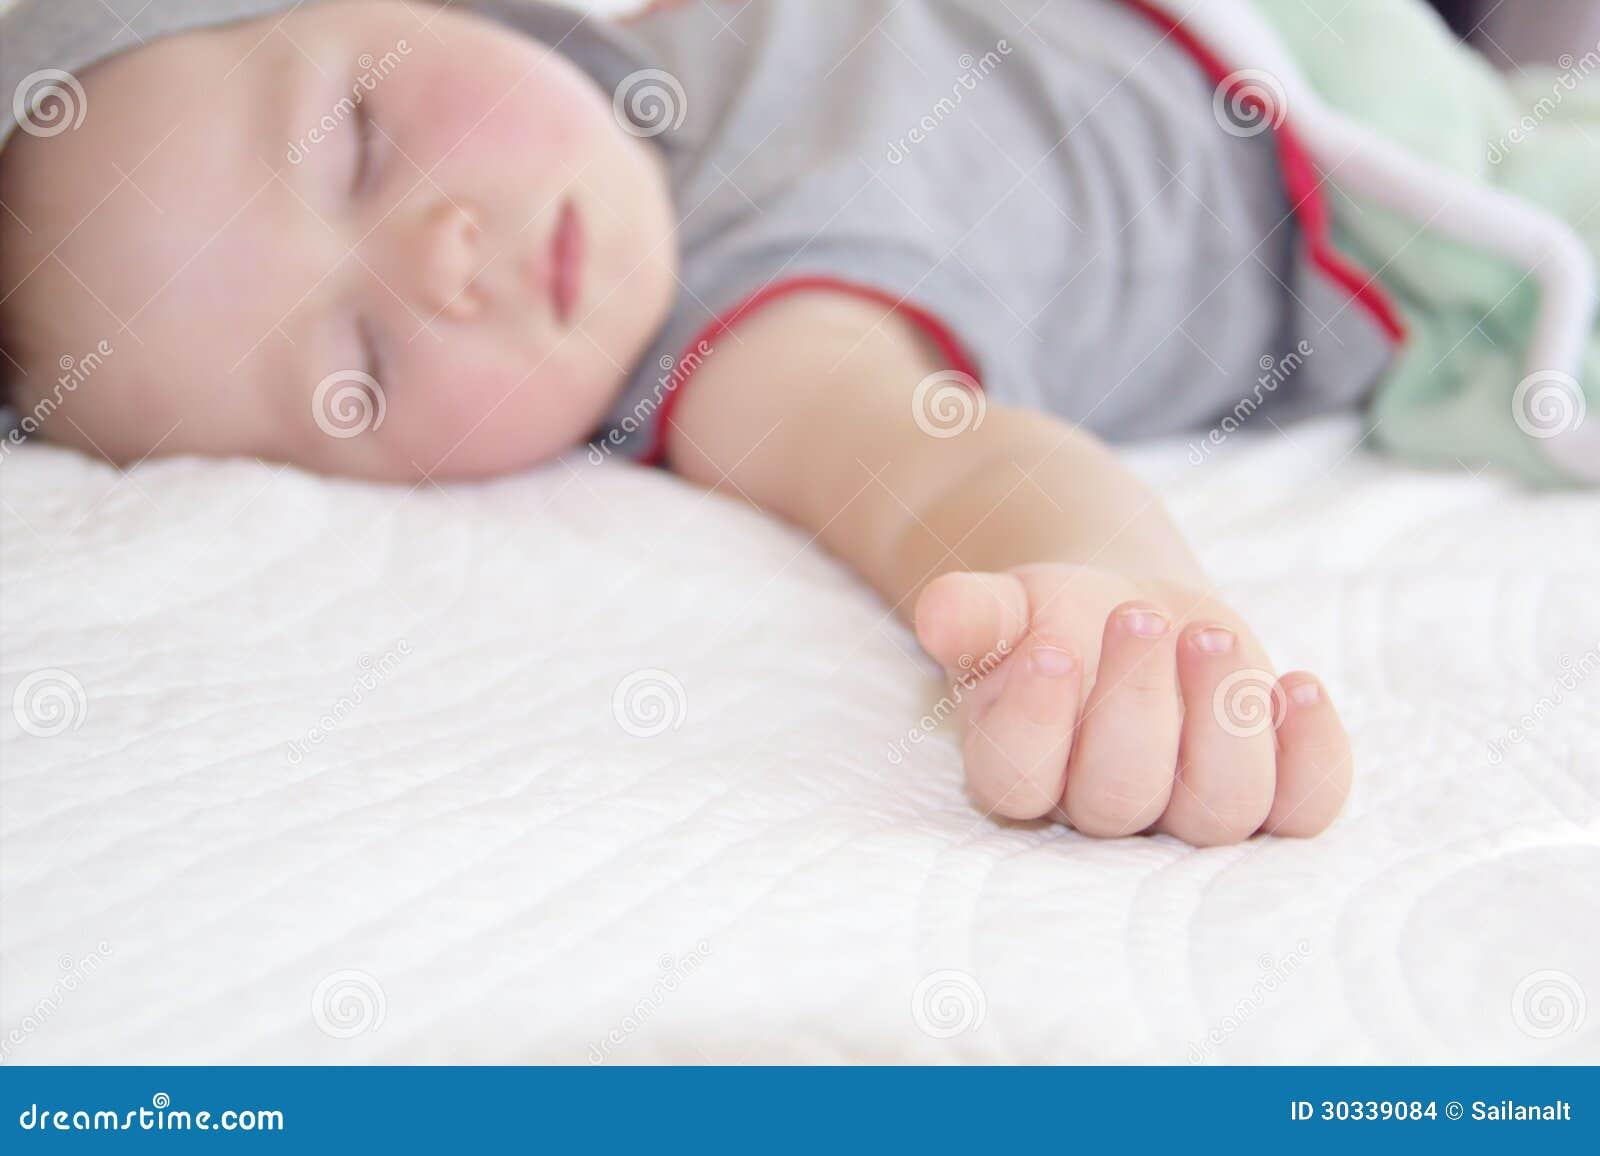 Видеть во сне младенца мальчика держать на руках своего